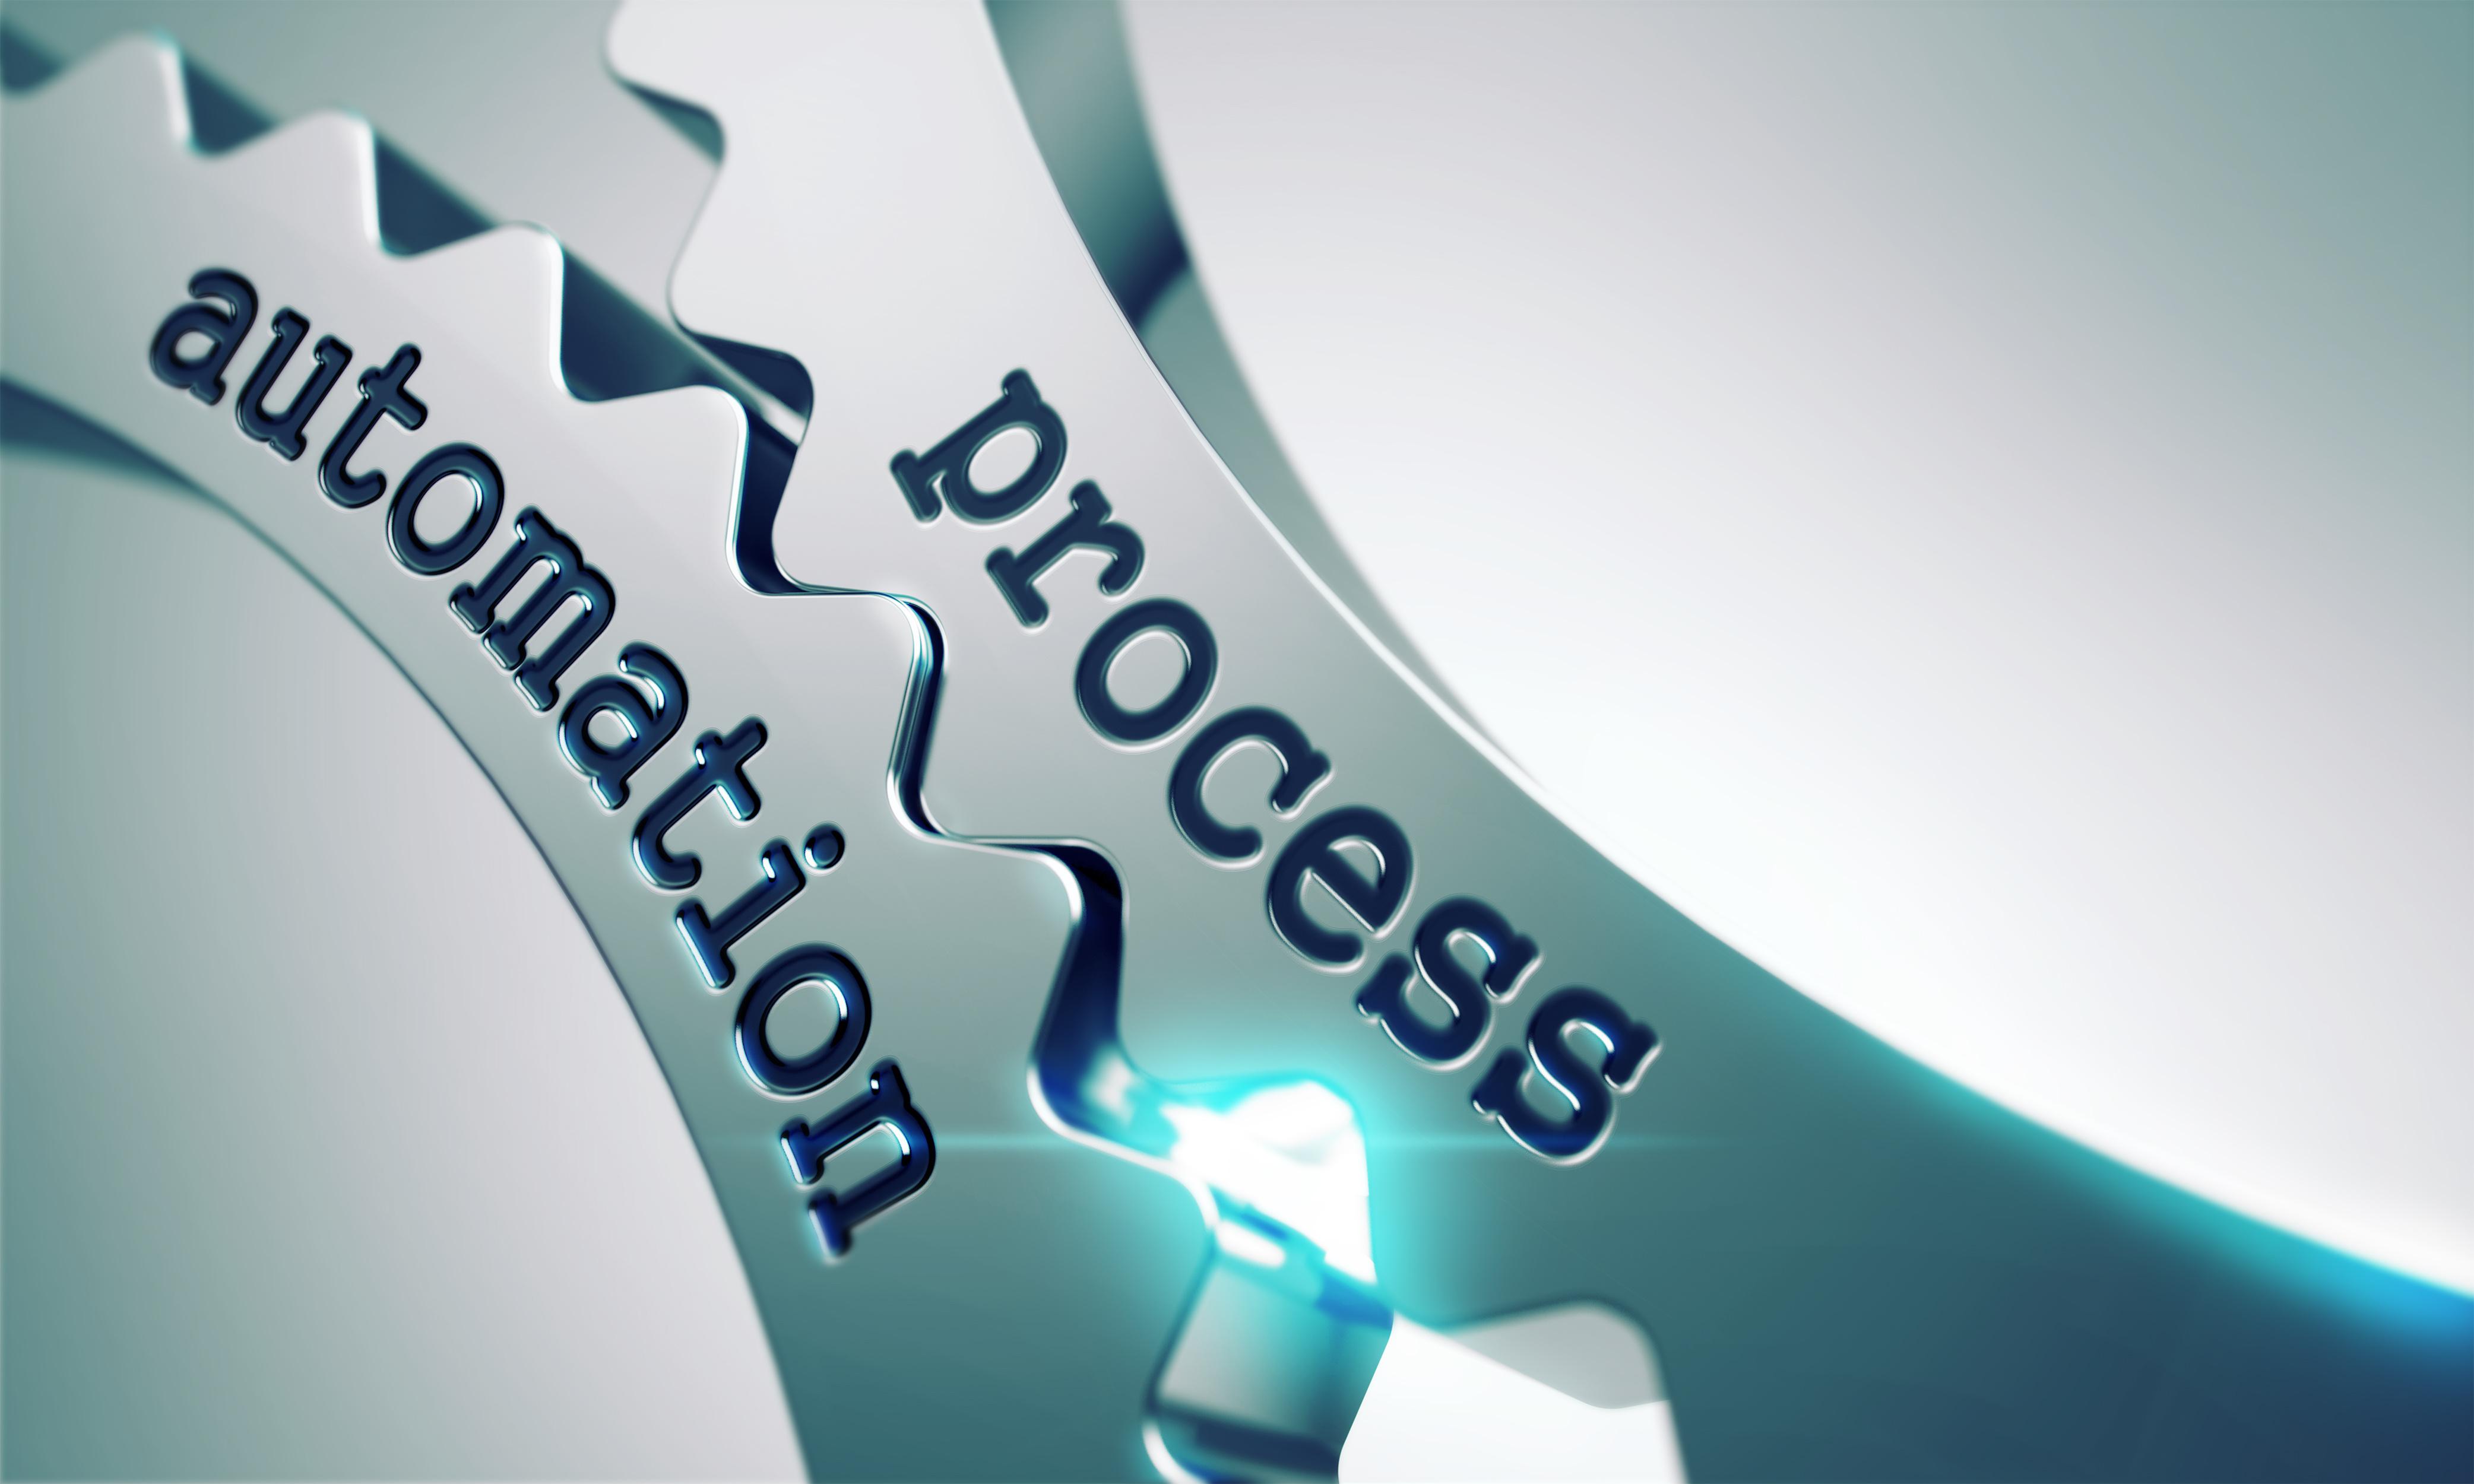 Process Automation written on gears